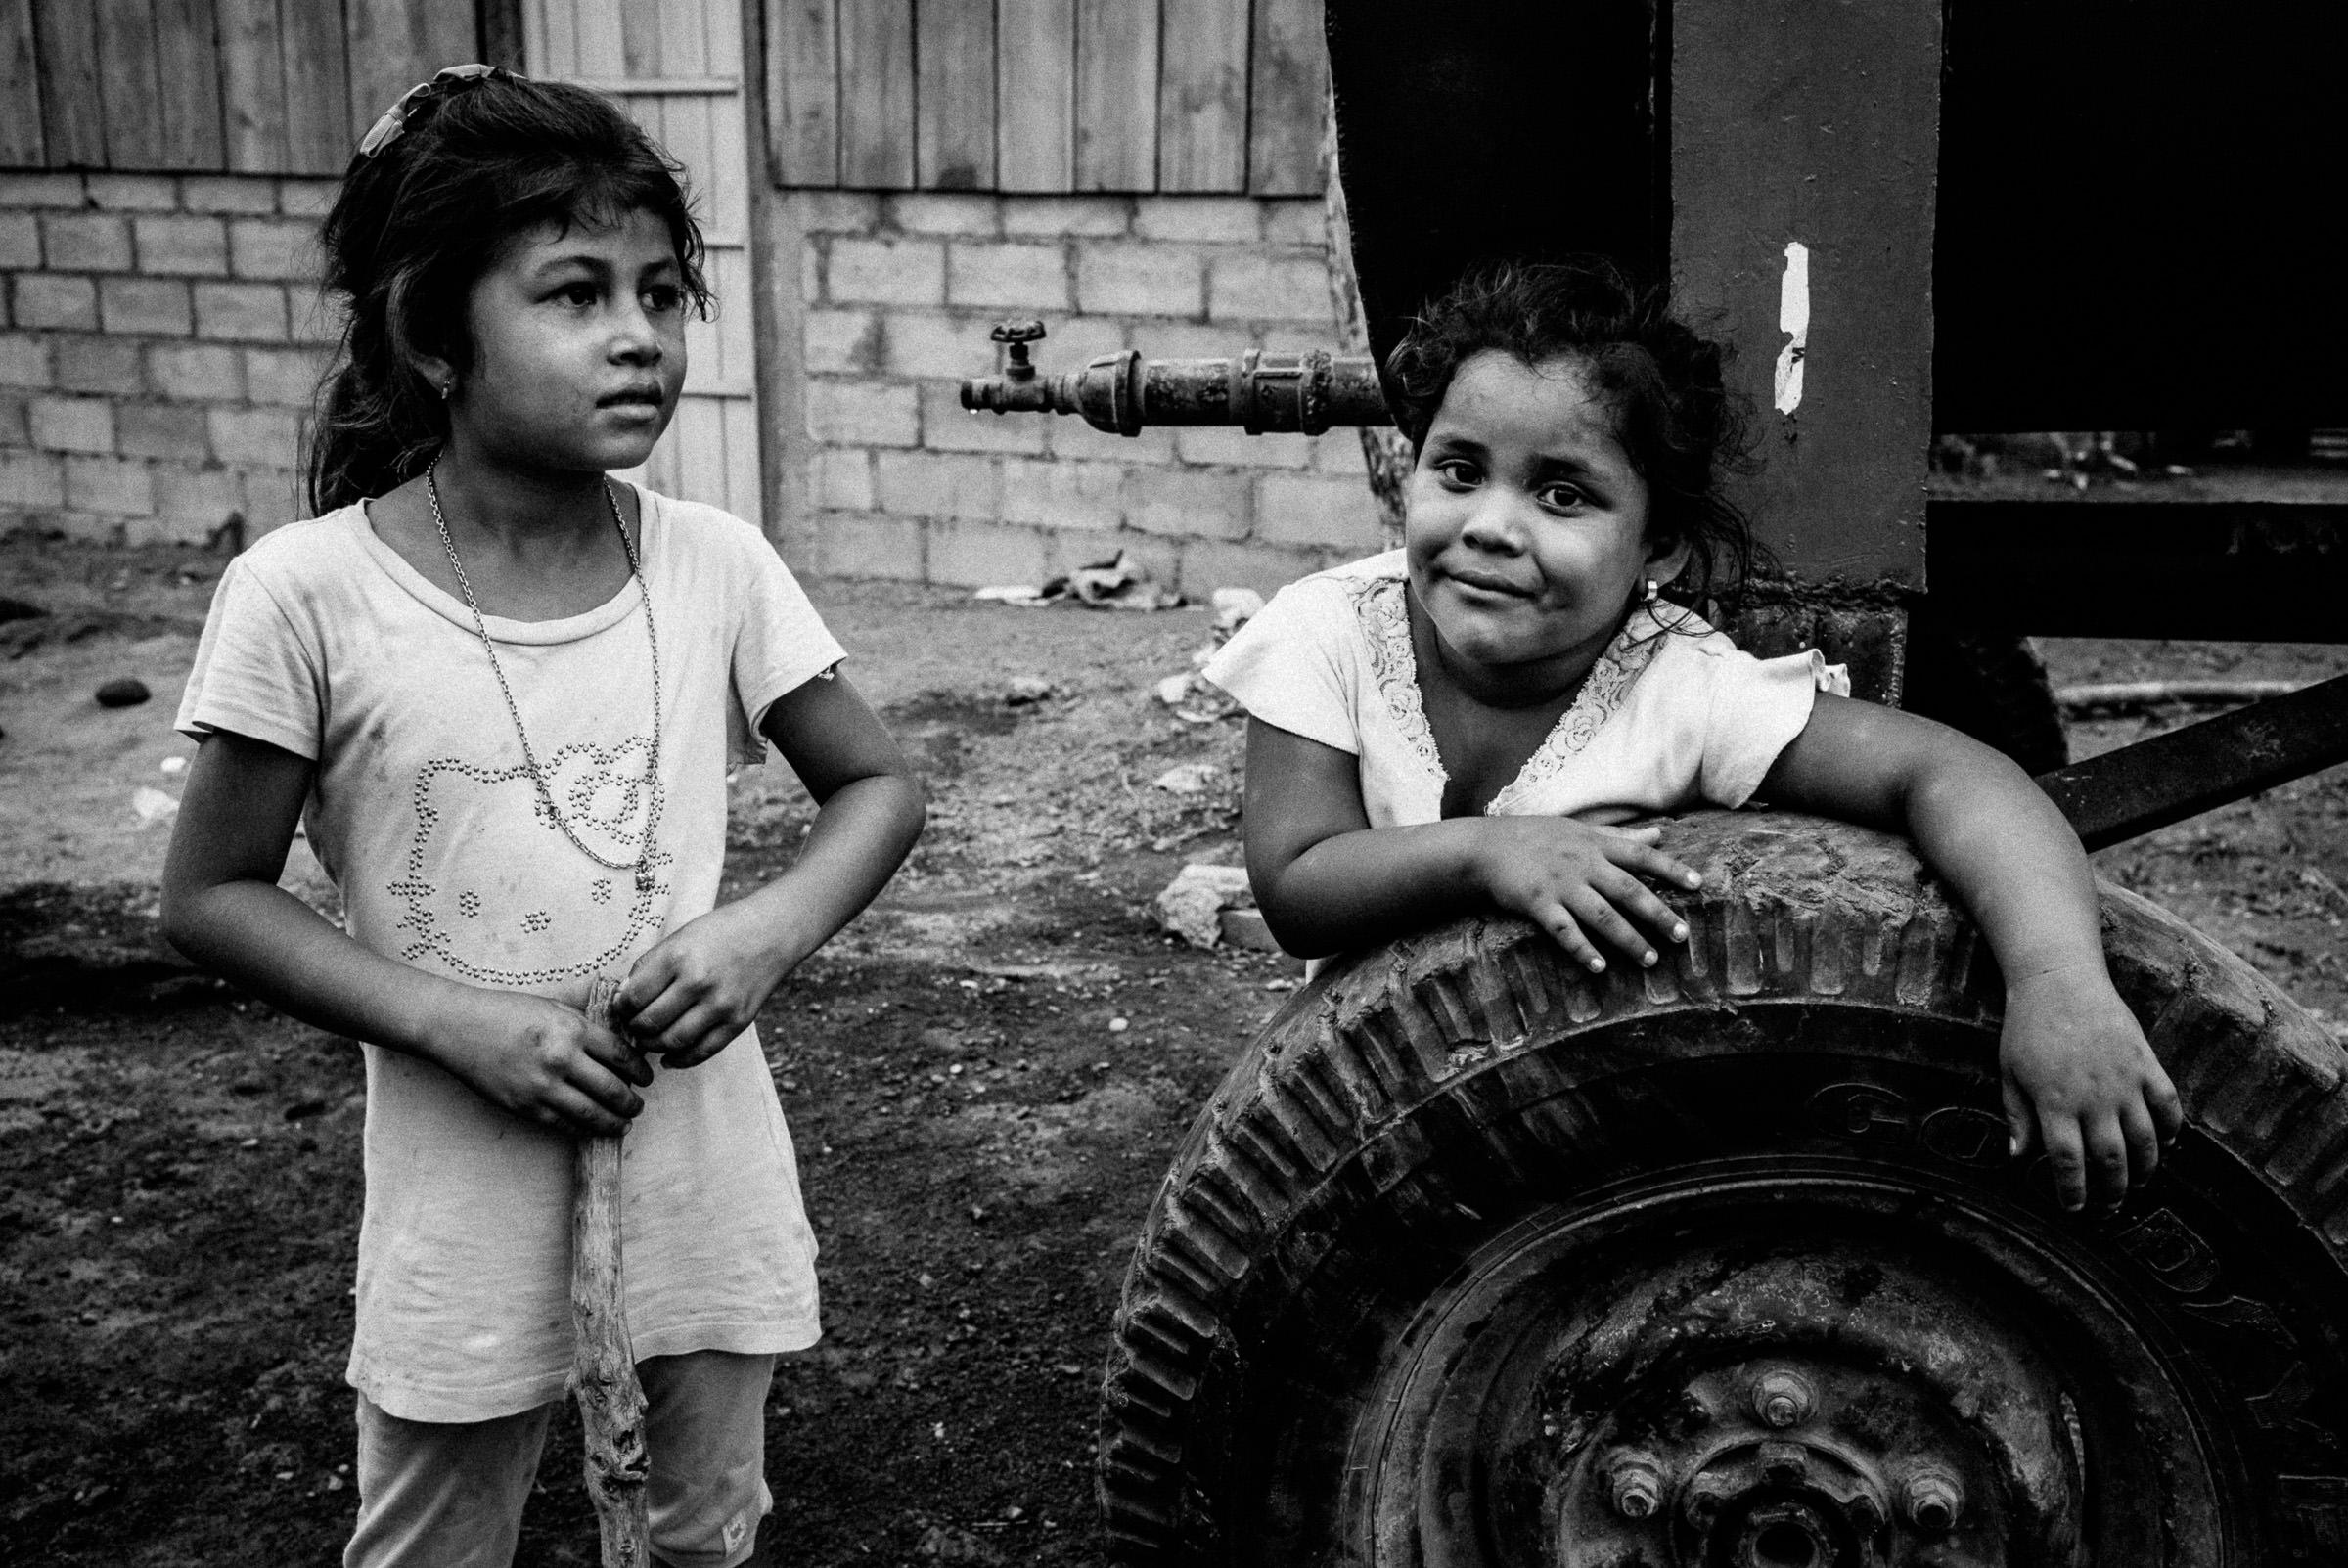 brandon_patoc_travel_photographer_in_nicaragua_0006.jpg